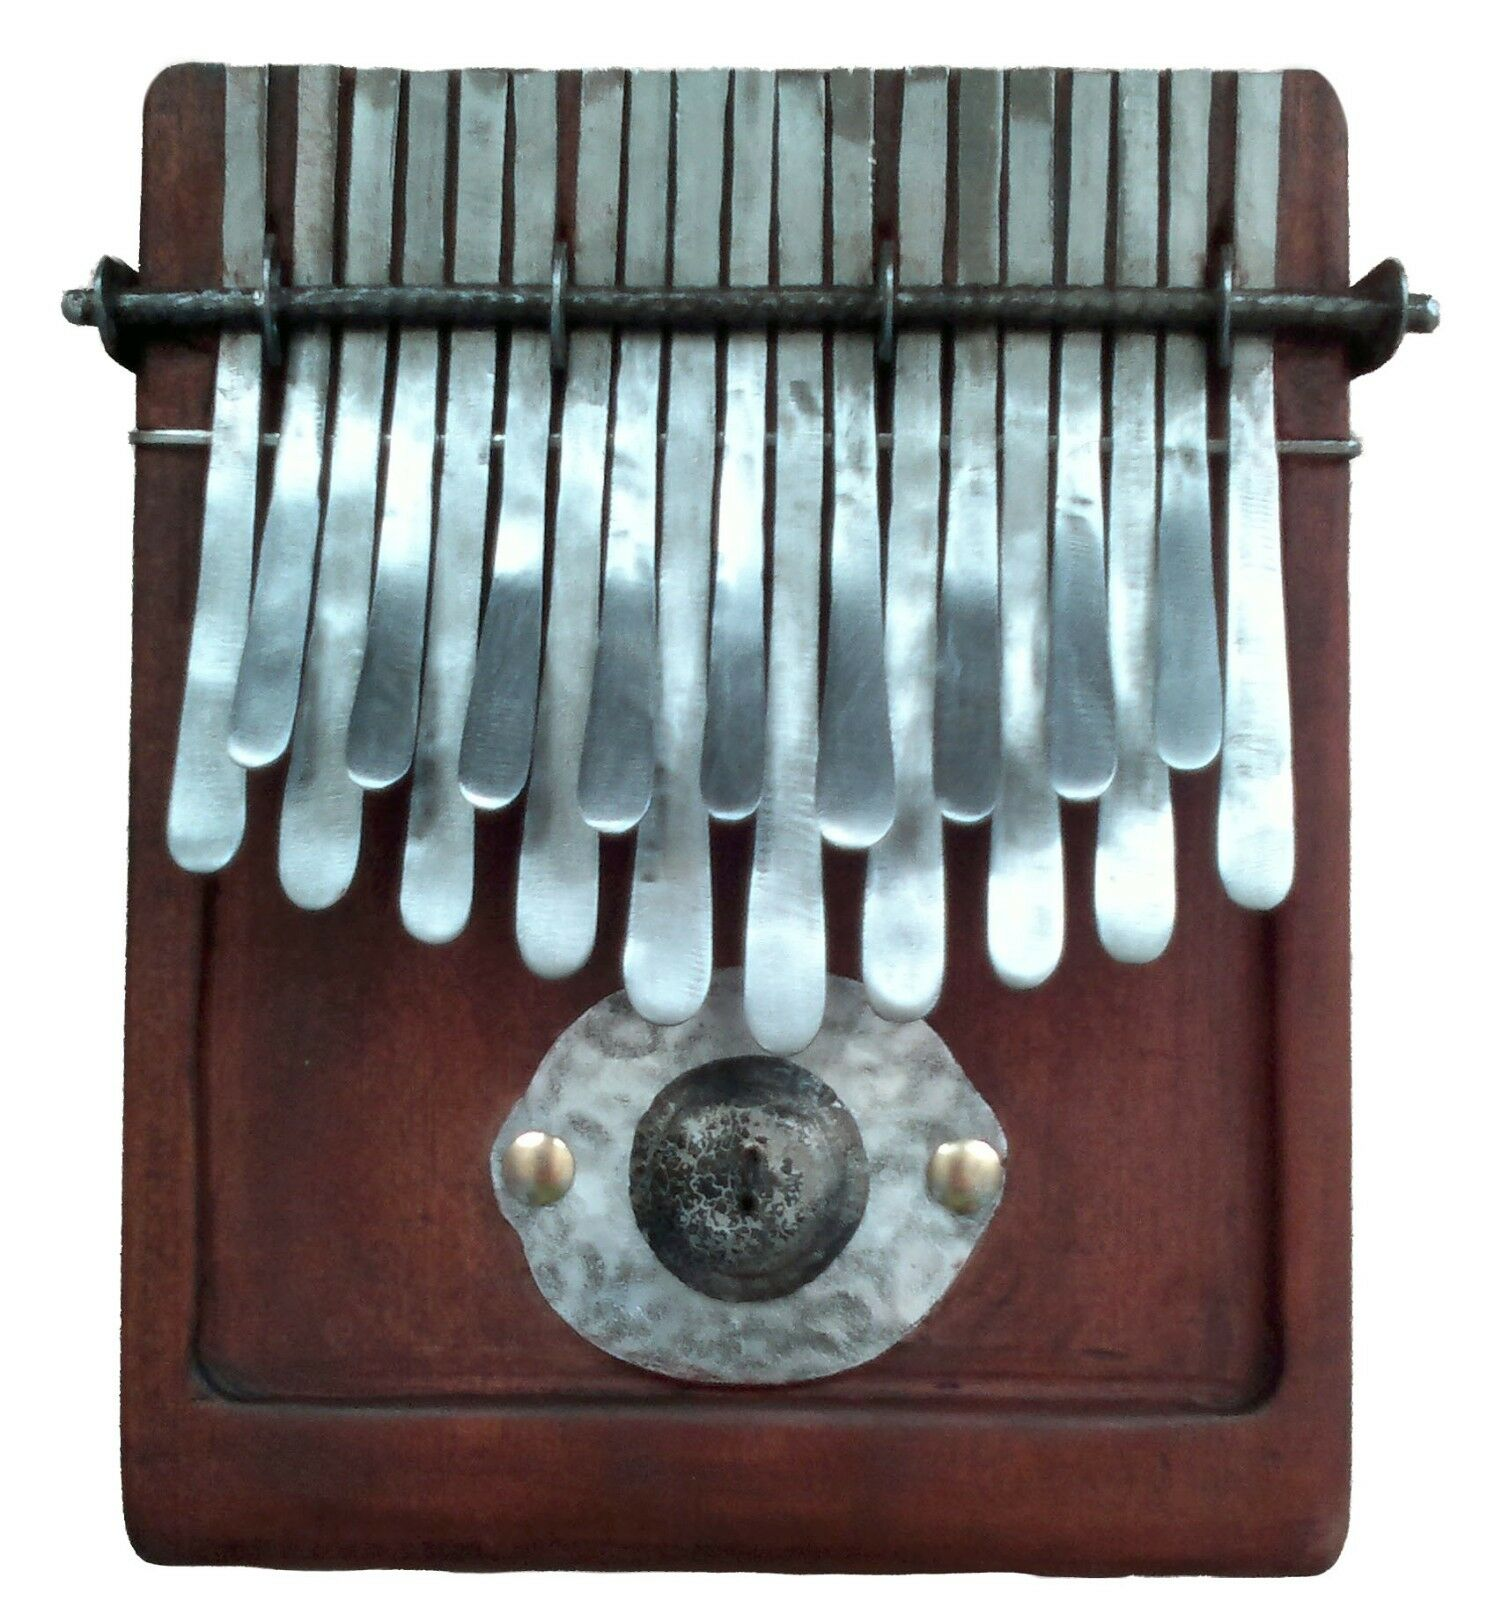 19-key Kalimba in F major tuning   Incl. kalimba bag   African thumb piano